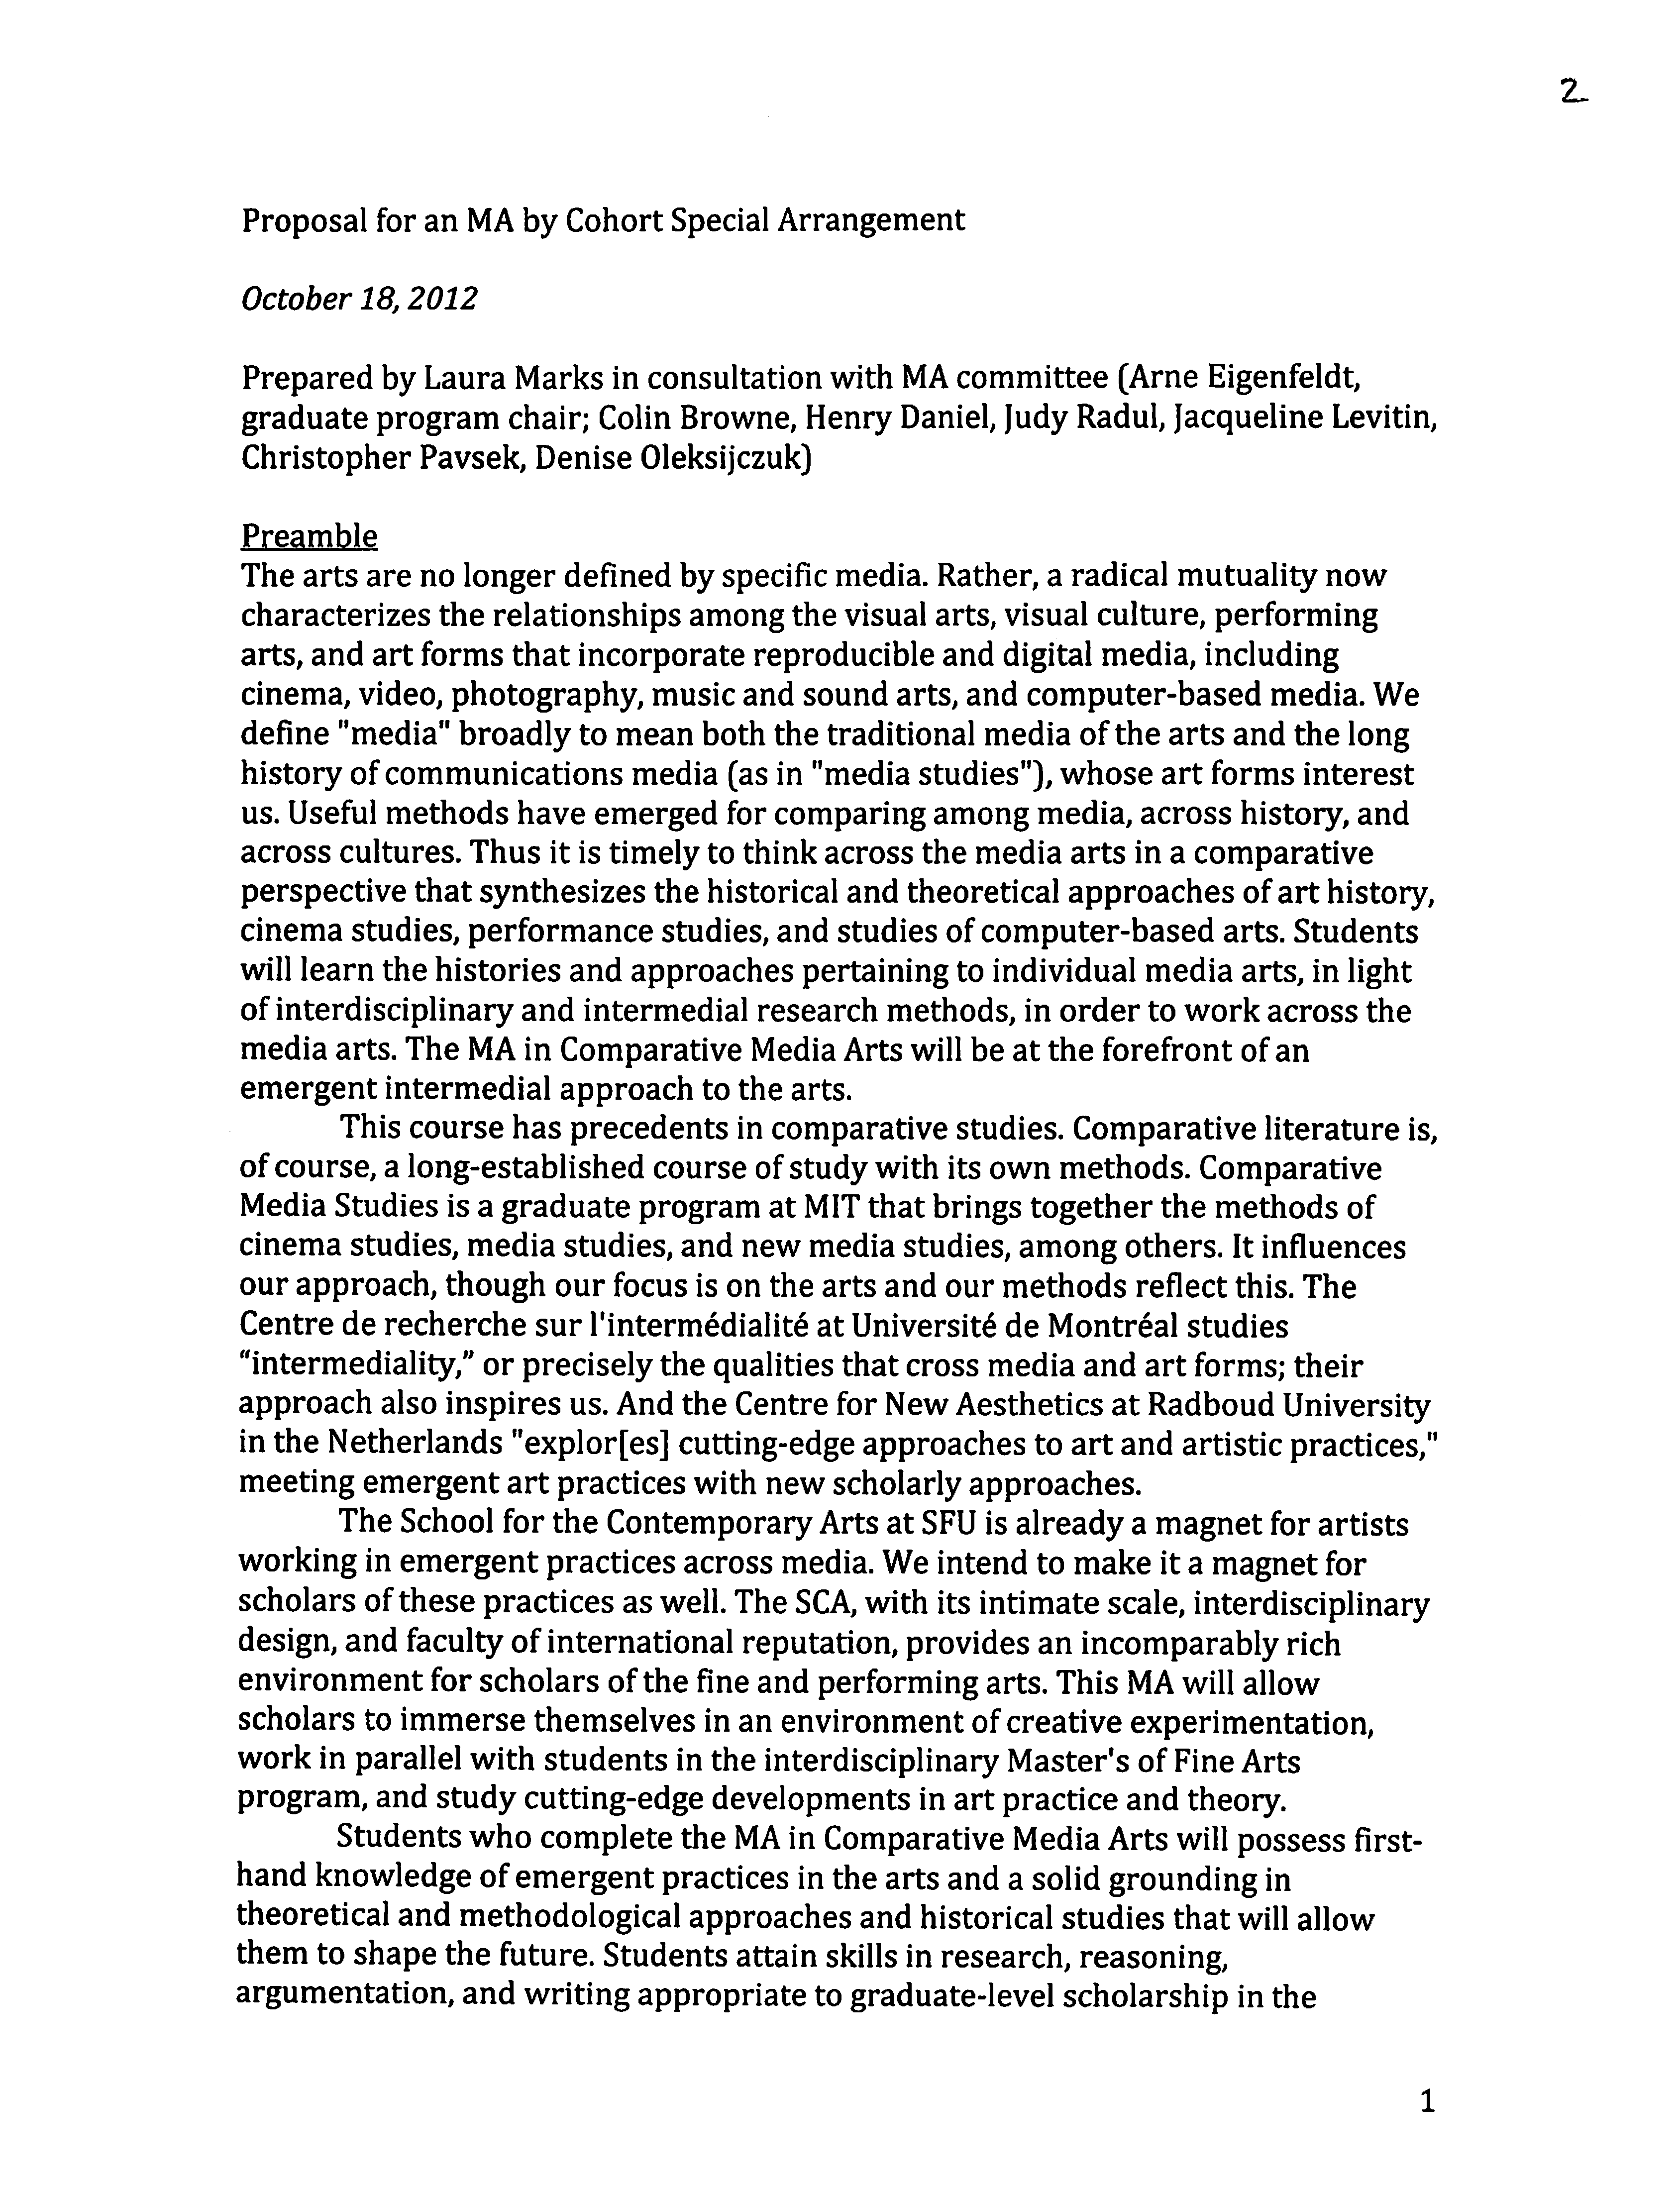 sshrc research proposal sample